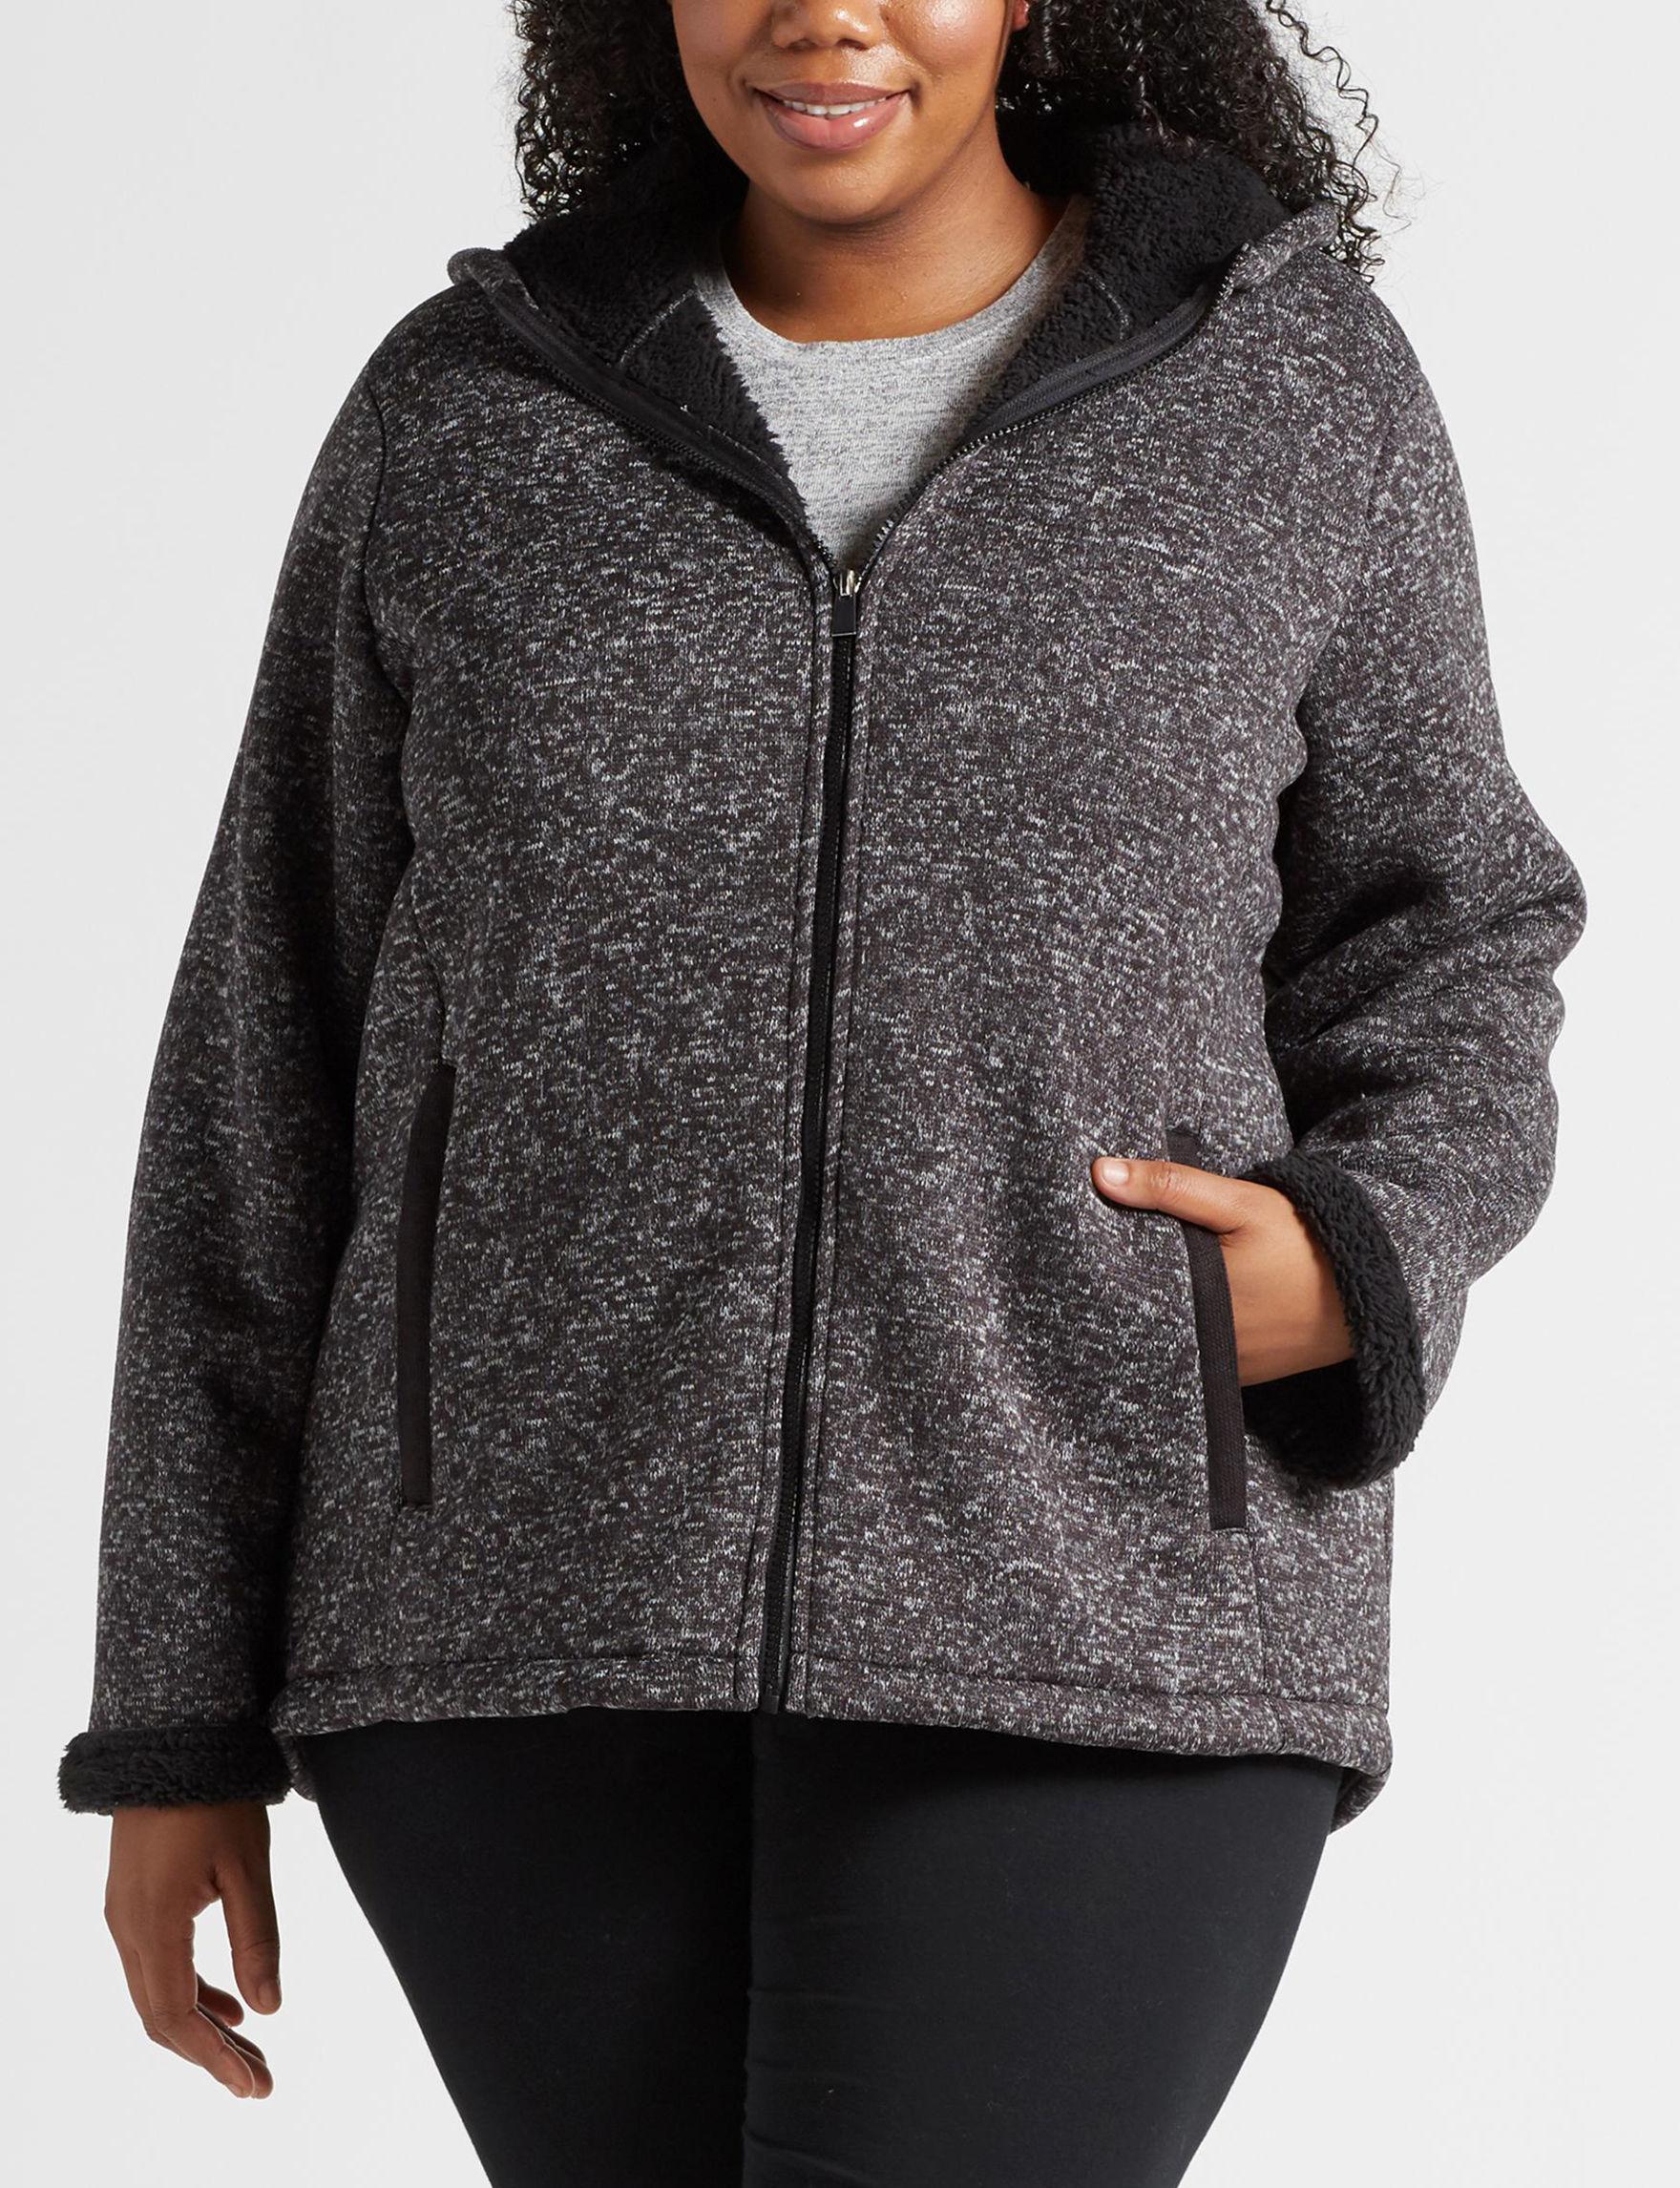 Details Black / White Fleece & Soft Shell Jackets